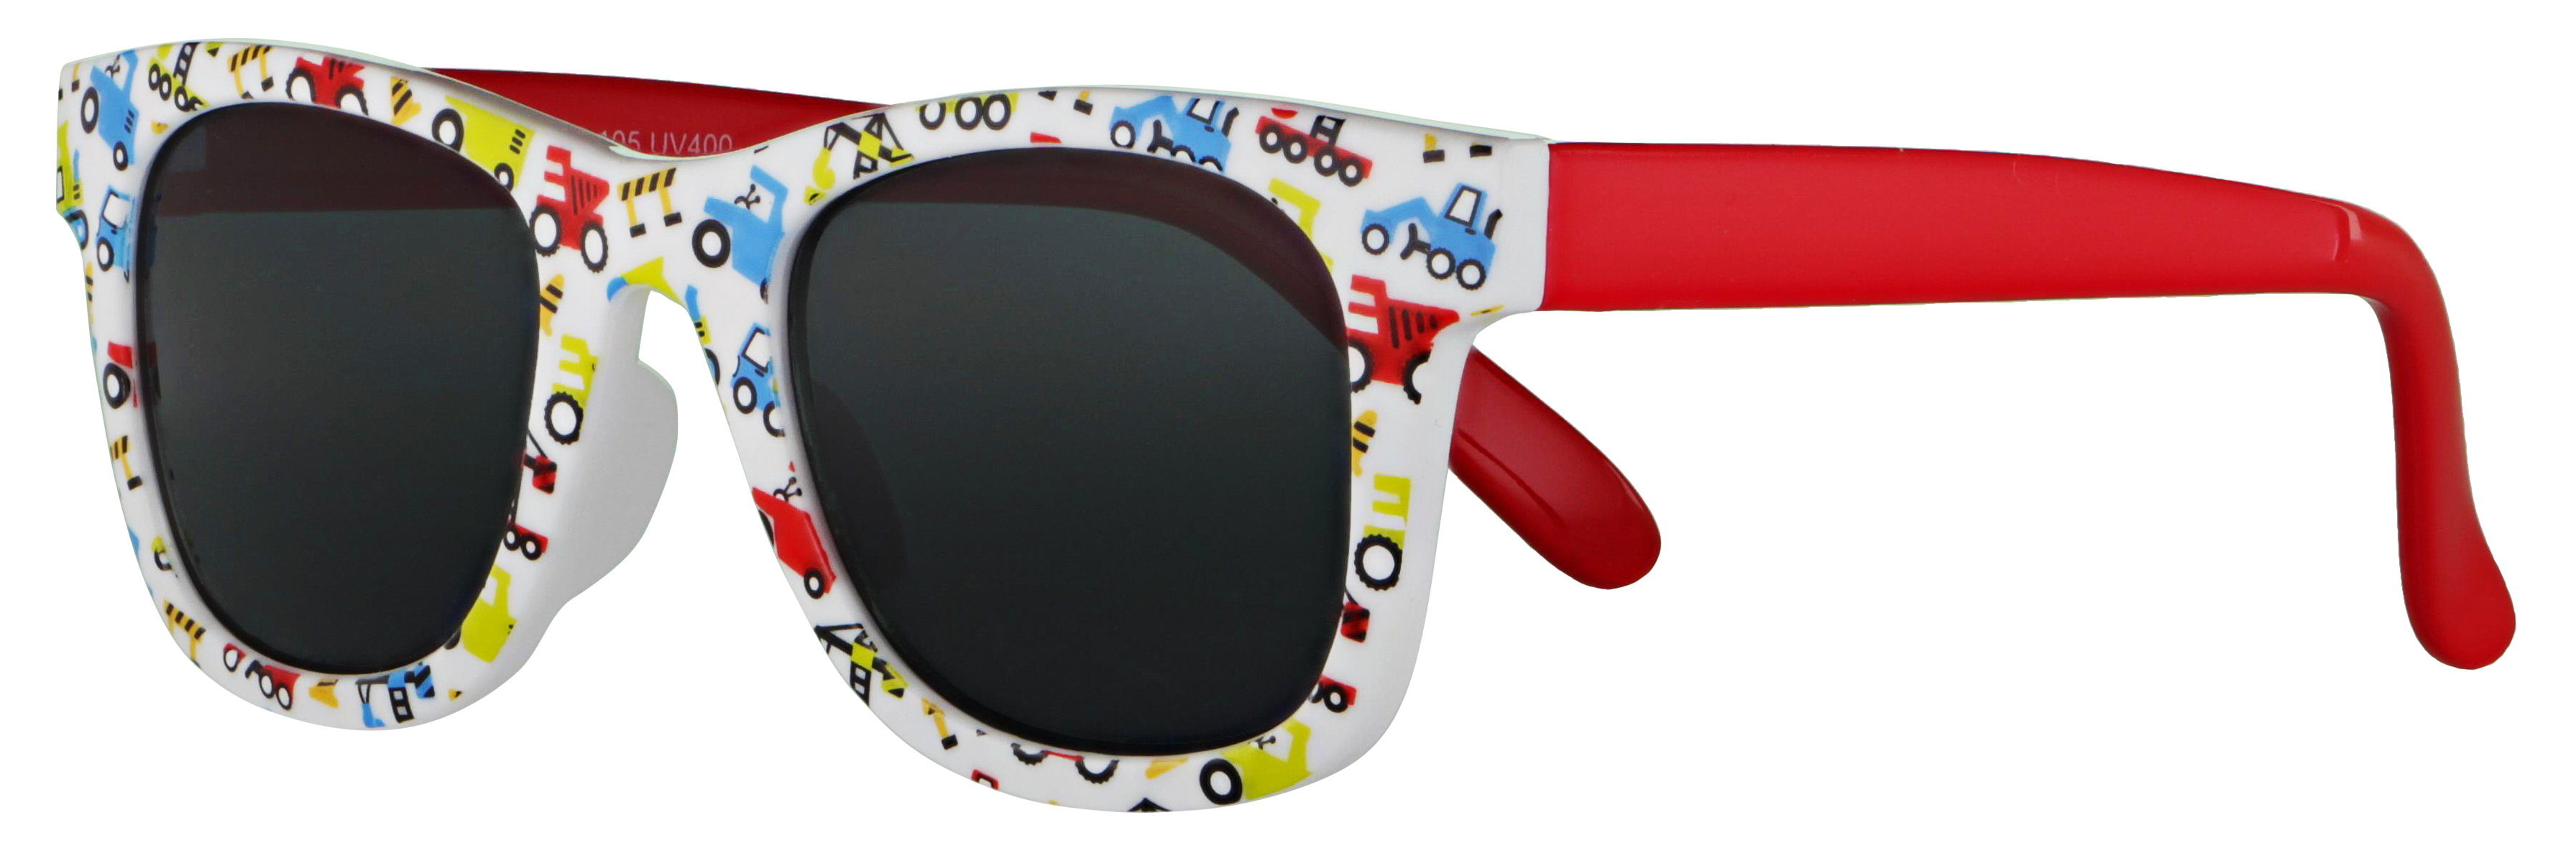 abele optik Kindersonnenbrille 717952